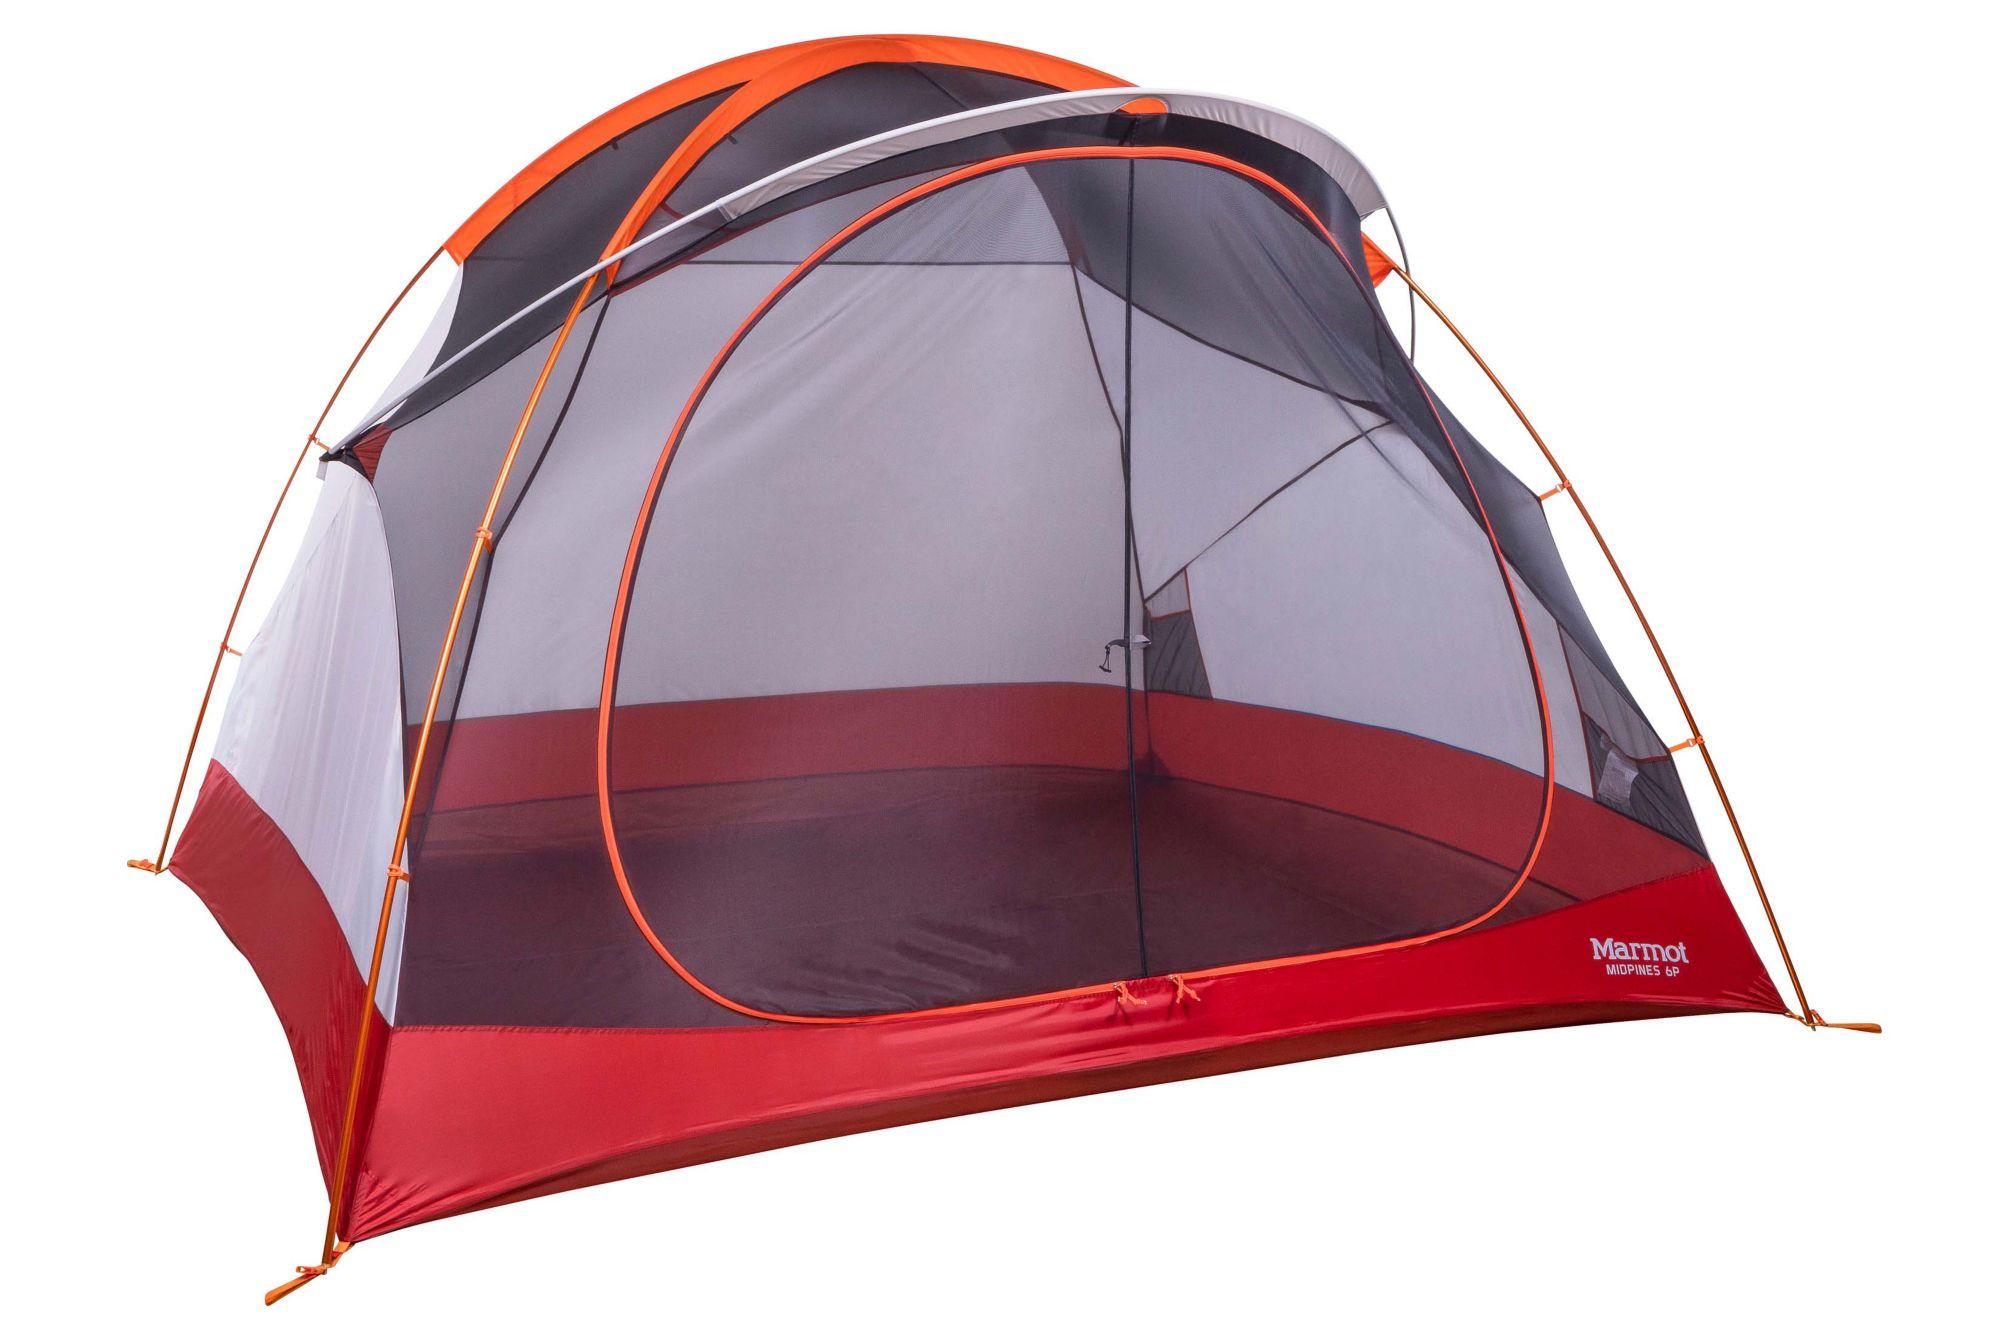 Midpines 6P Orange Spice/Arona medium  sc 1 st  Marmot & Tents / Equipment   Marmot.com